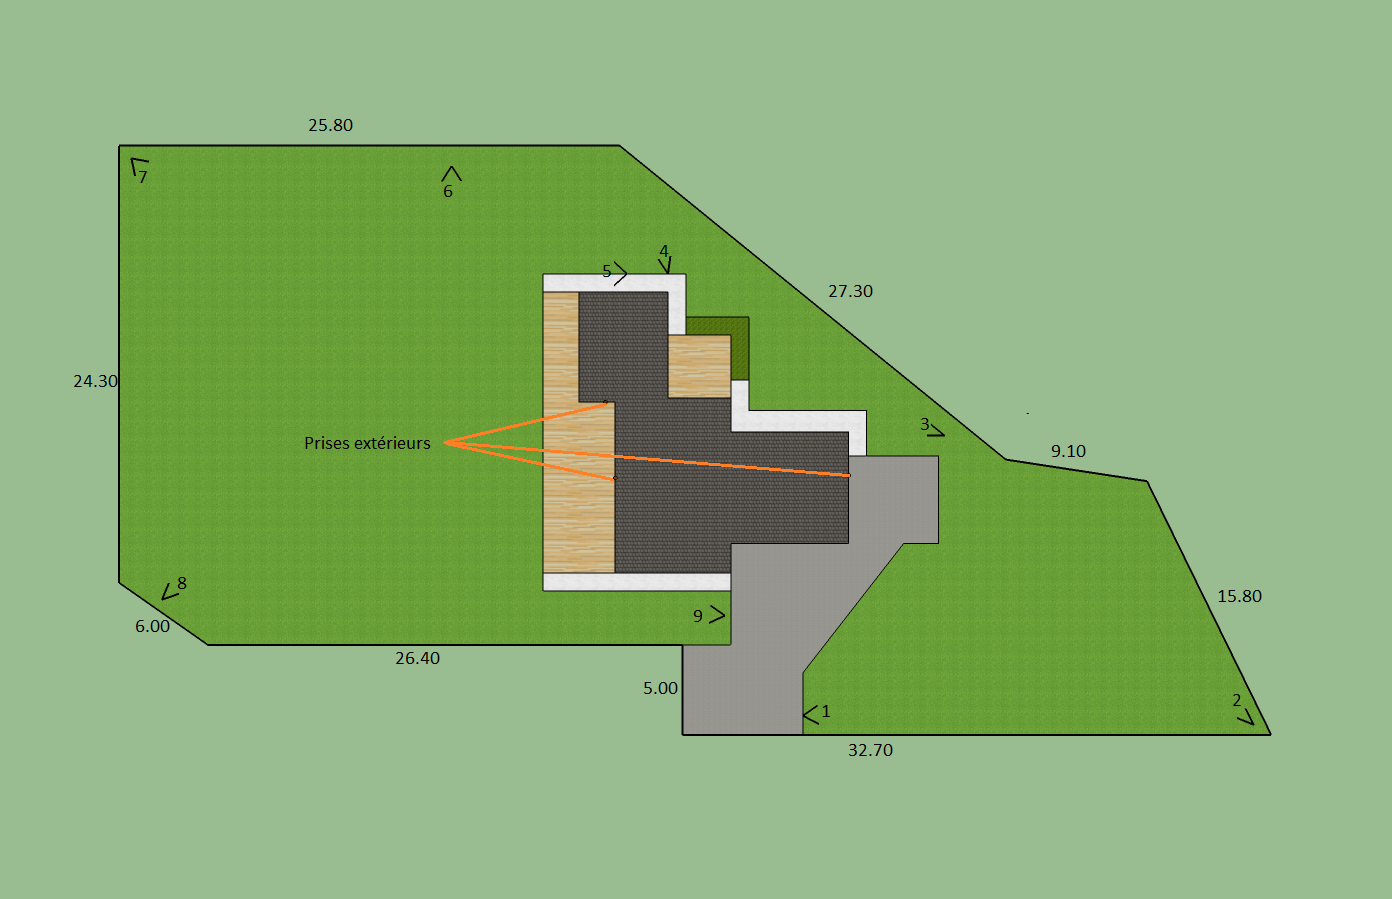 https://image.ibb.co/fS9RML/terrain-v1.png